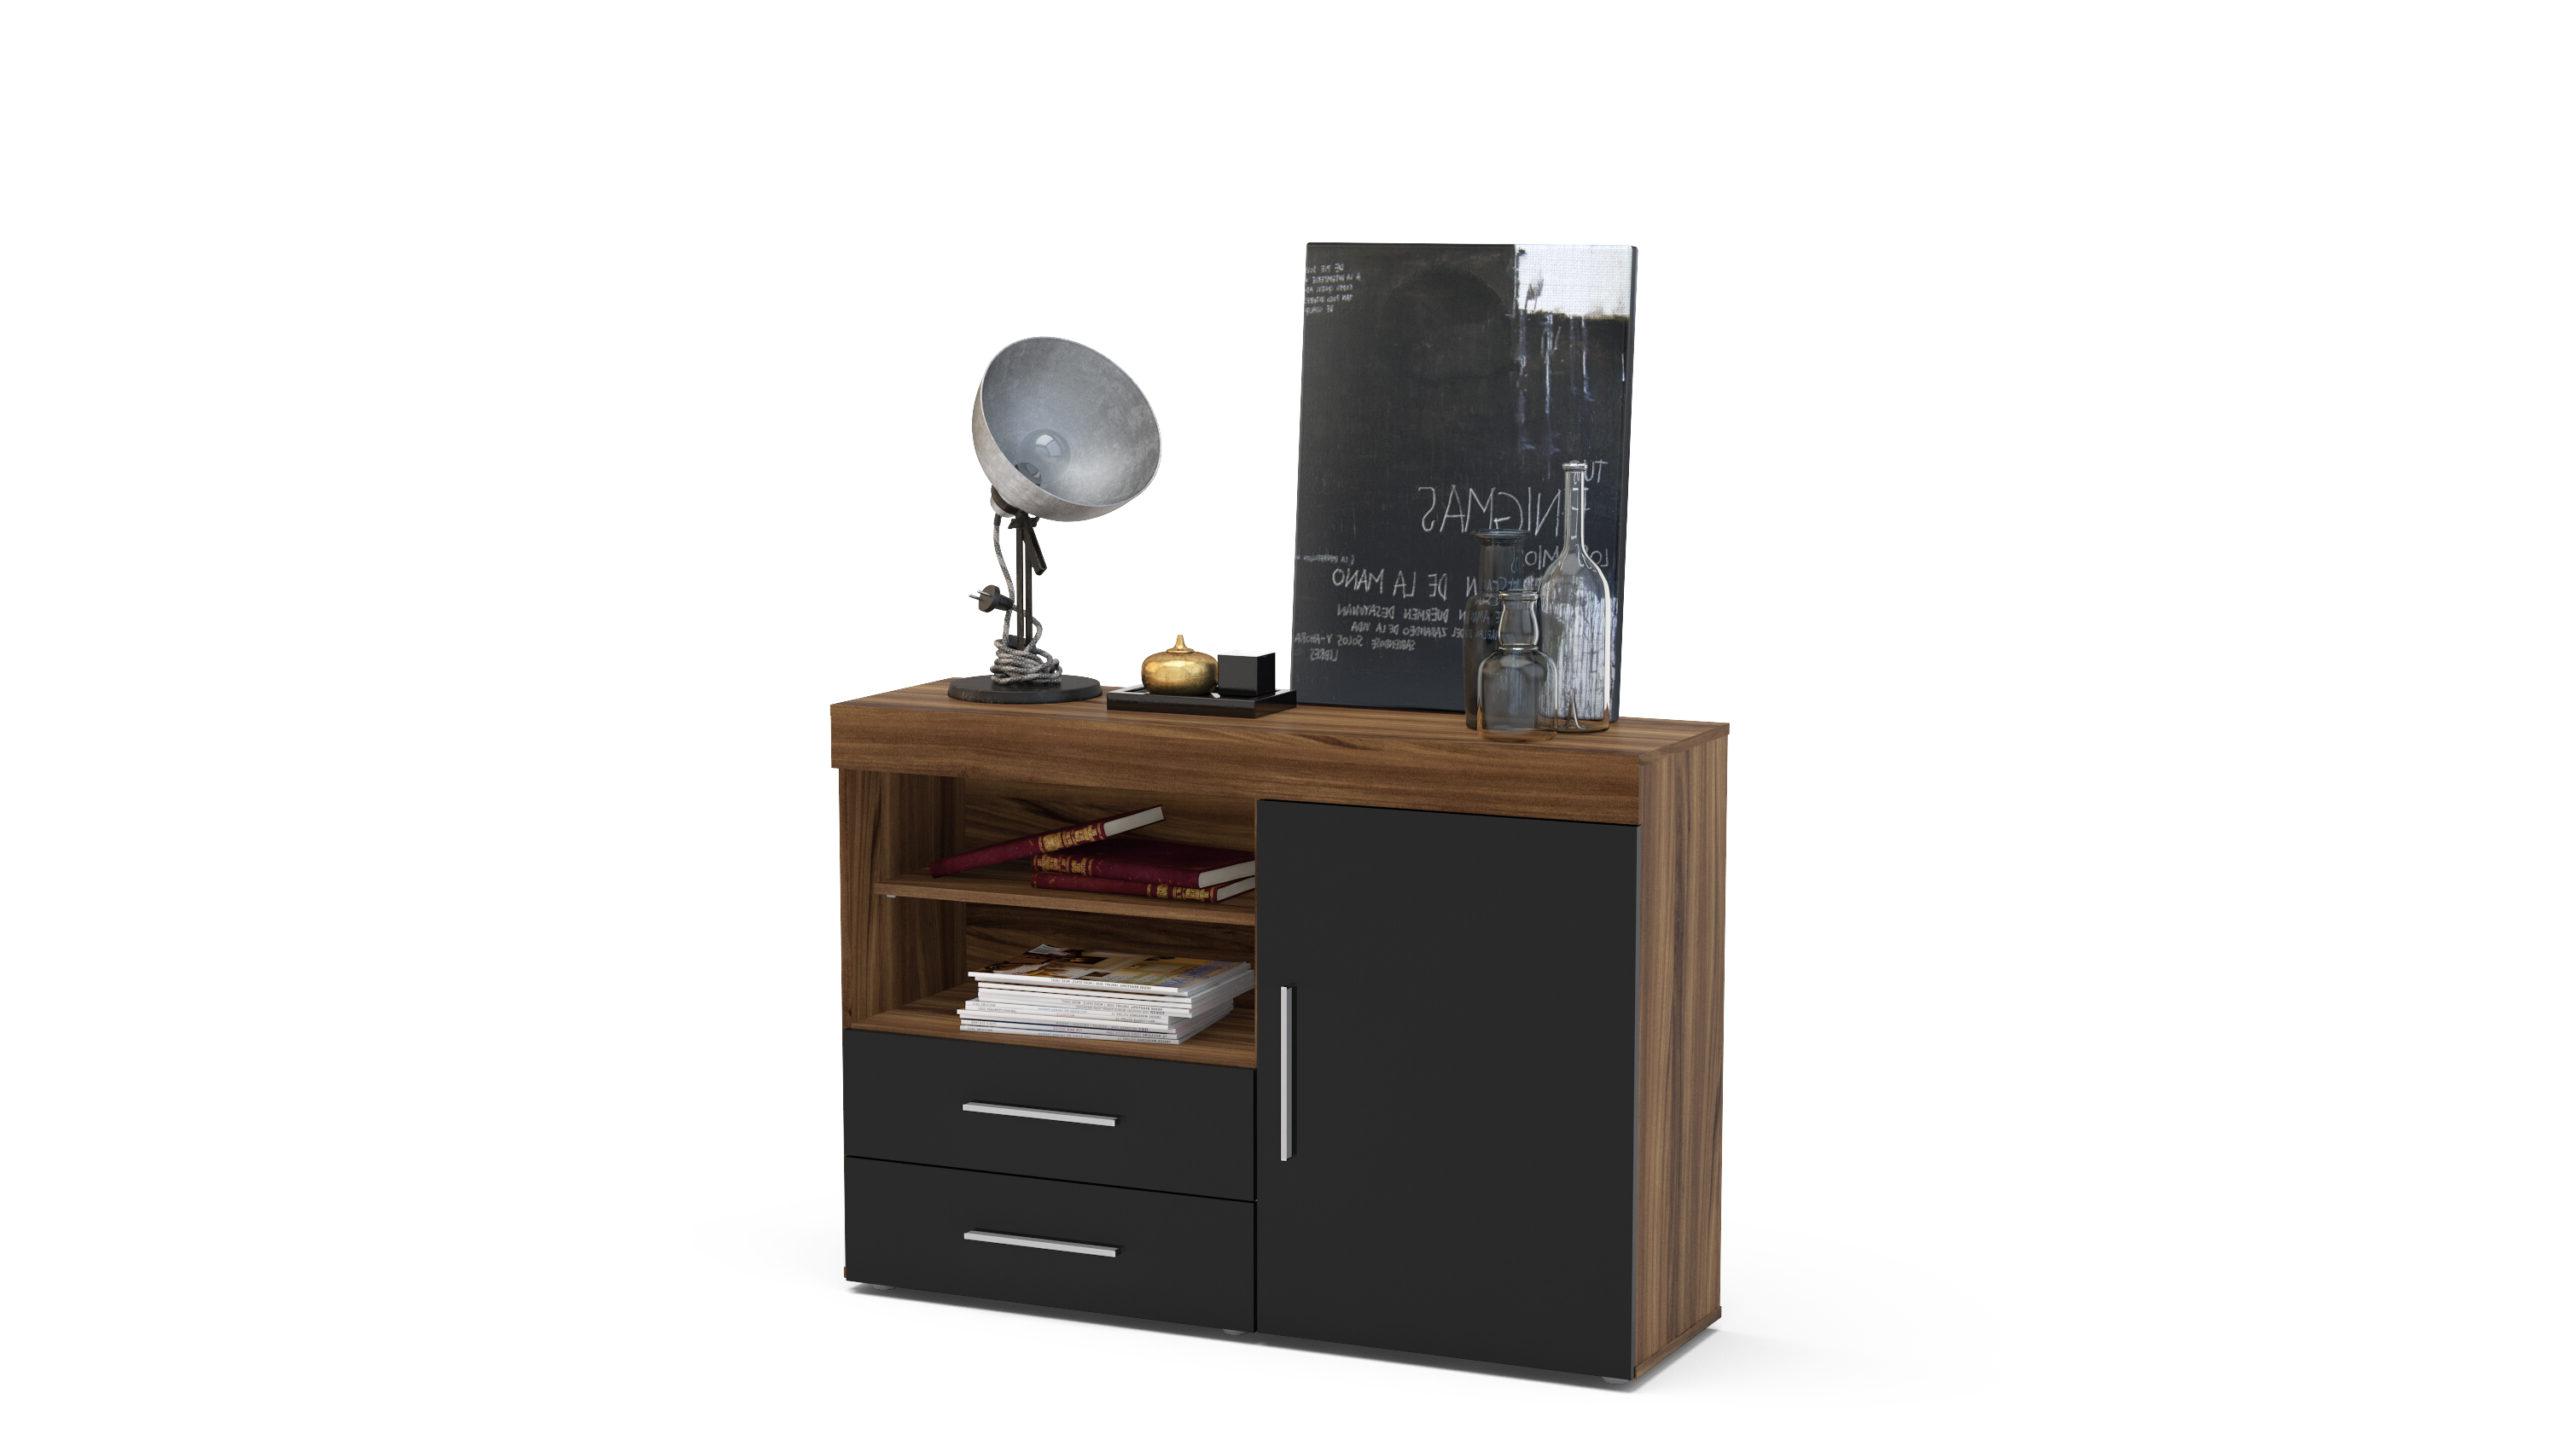 Edgeware 1 Door 2 Drawer Sideboard Walnut & Black – Niture Uk Pertaining To Edgeware Tv Stands (View 6 of 20)